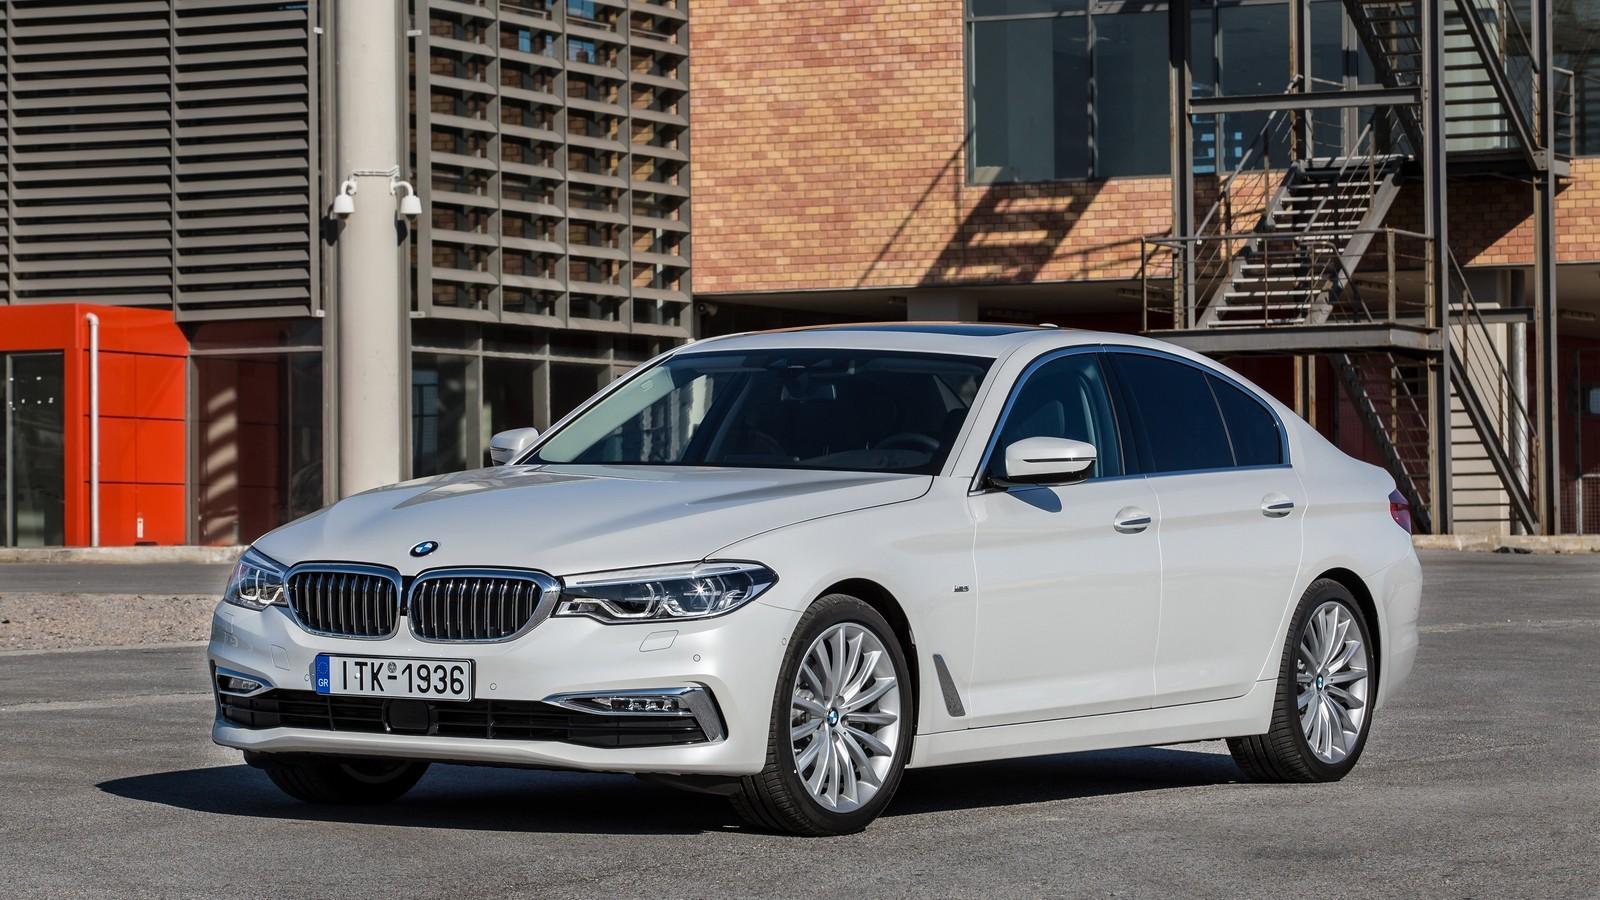 BMW 520d Sedan Luxury Line Worldwide (G30) '2017